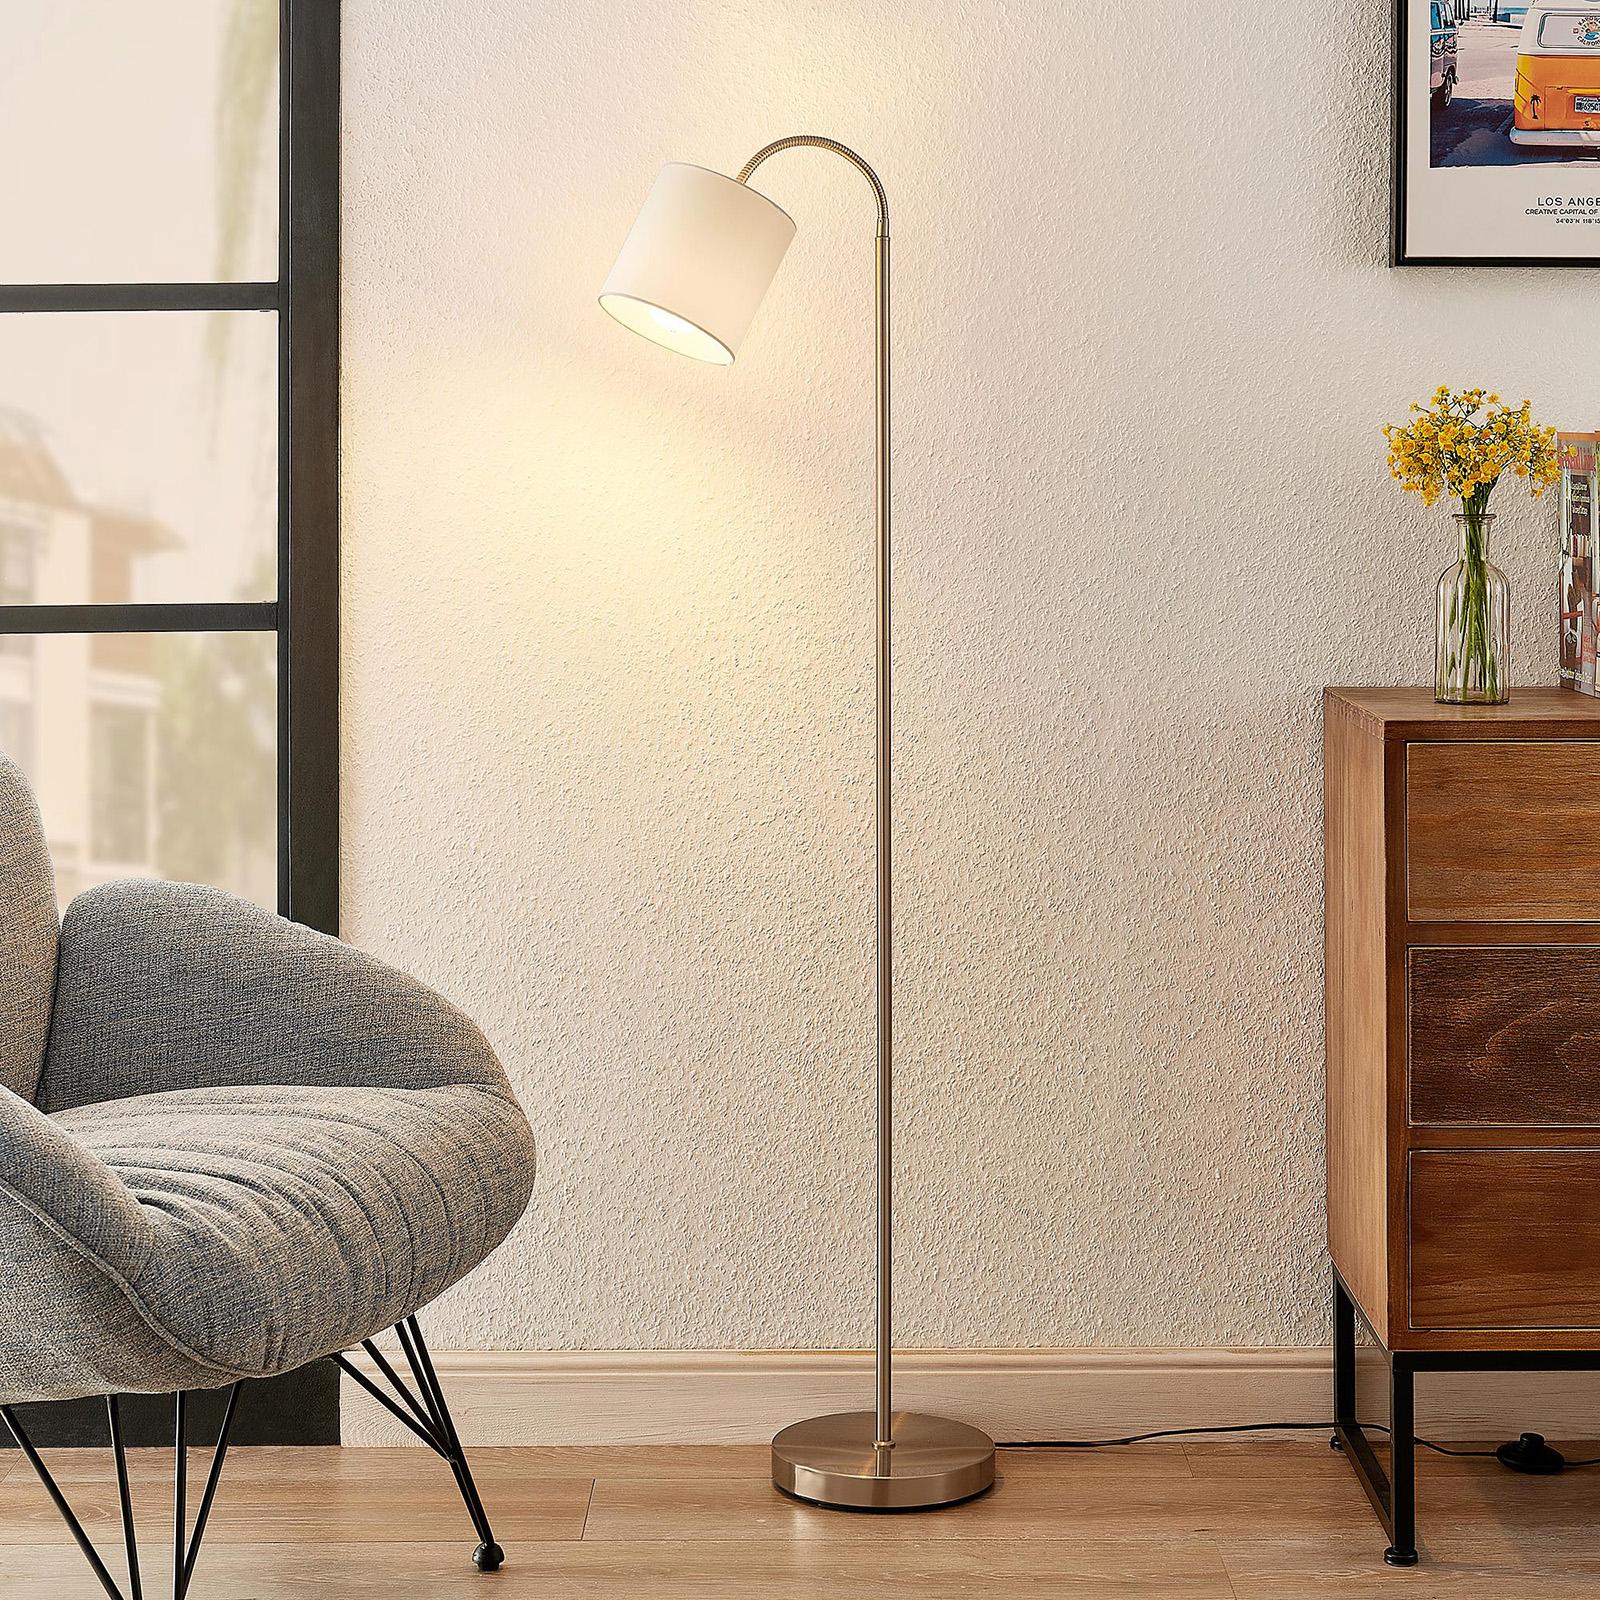 Lindby Manu Stehlampe, Textil, einflammig, weiß